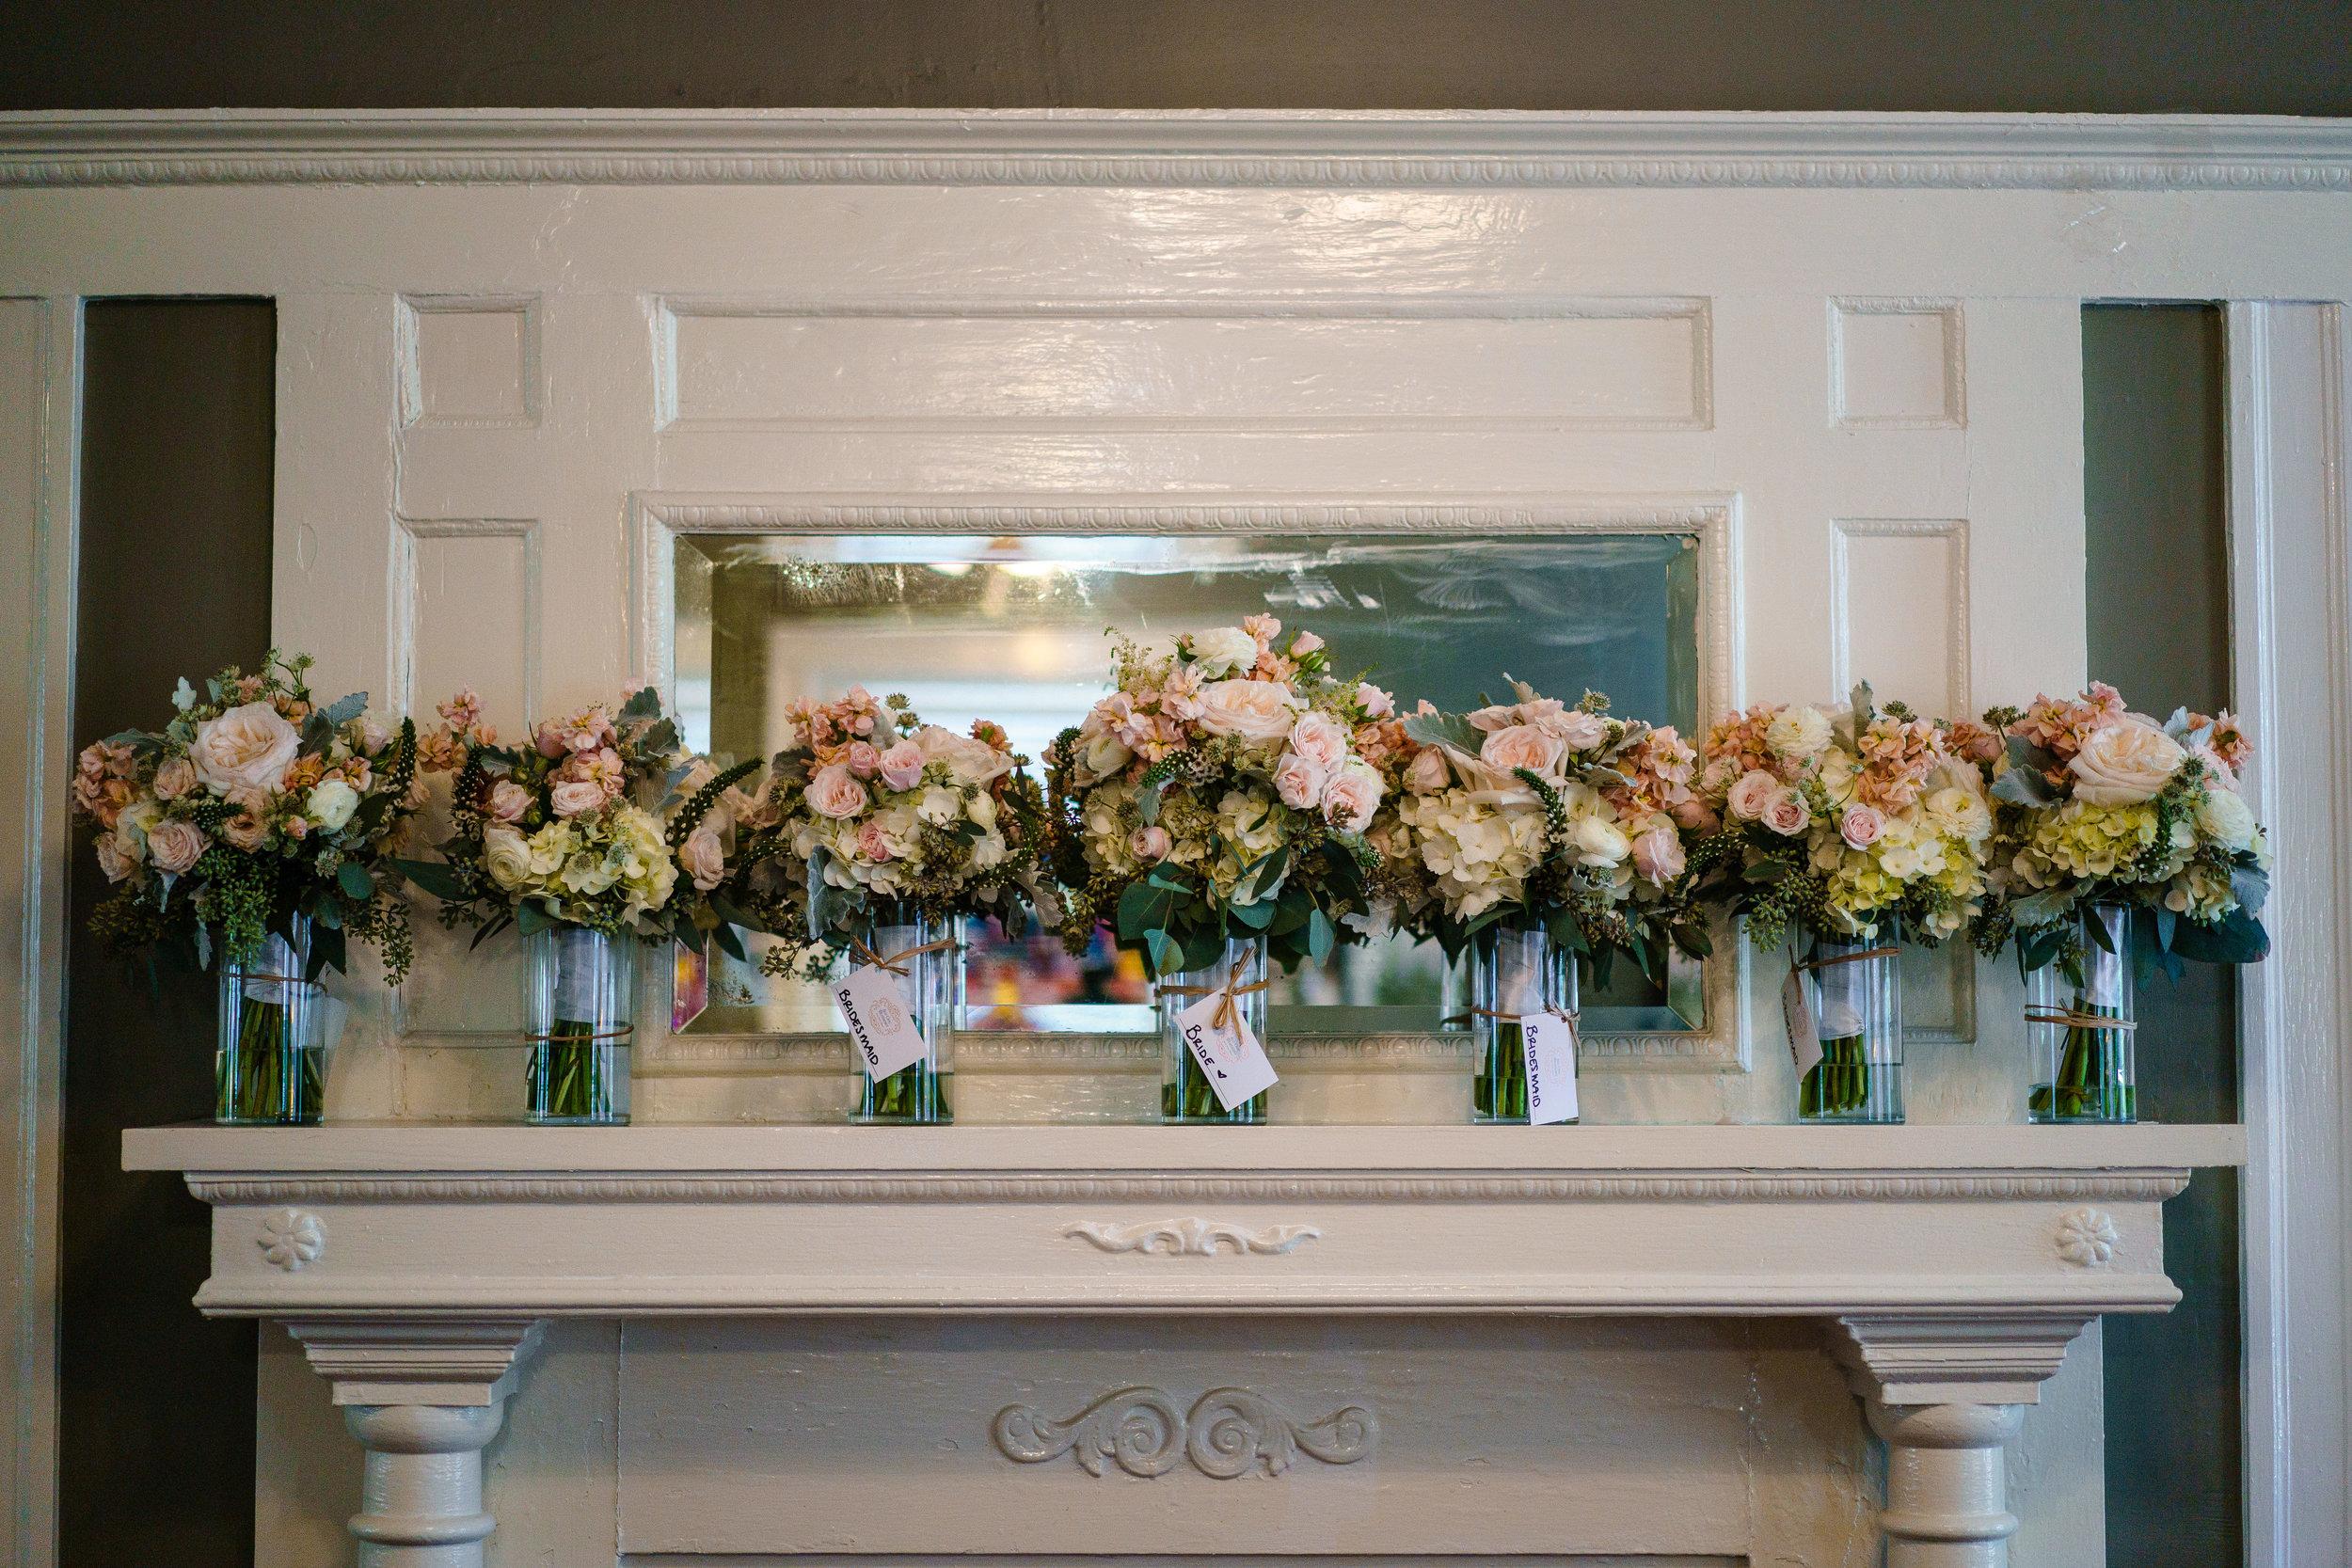 Echo-Chic-Angela&Andrew-Wedding-Florist.jpg